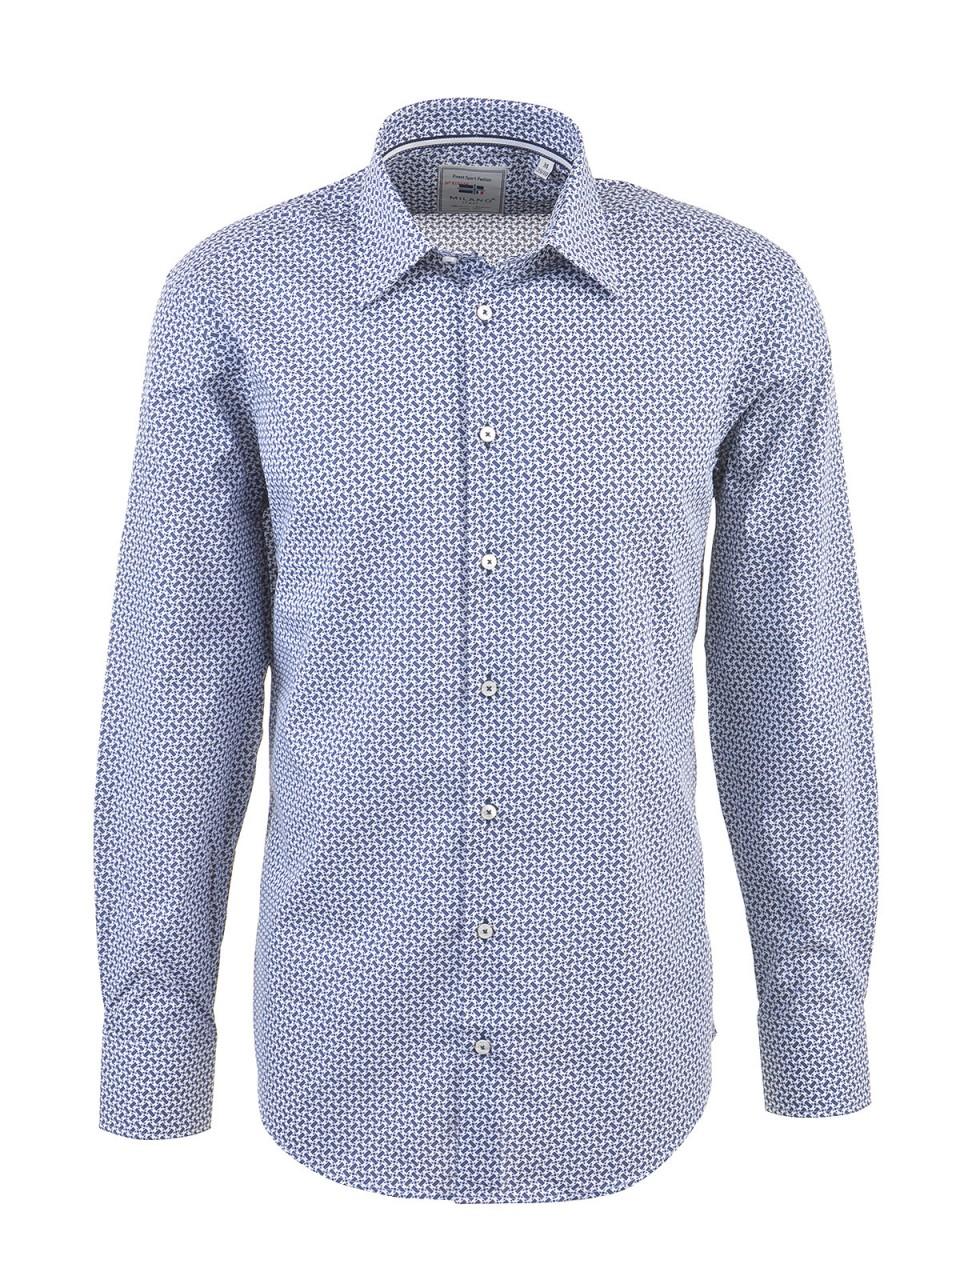 milano-italy-herren-hemd-blau-wei-szlig-